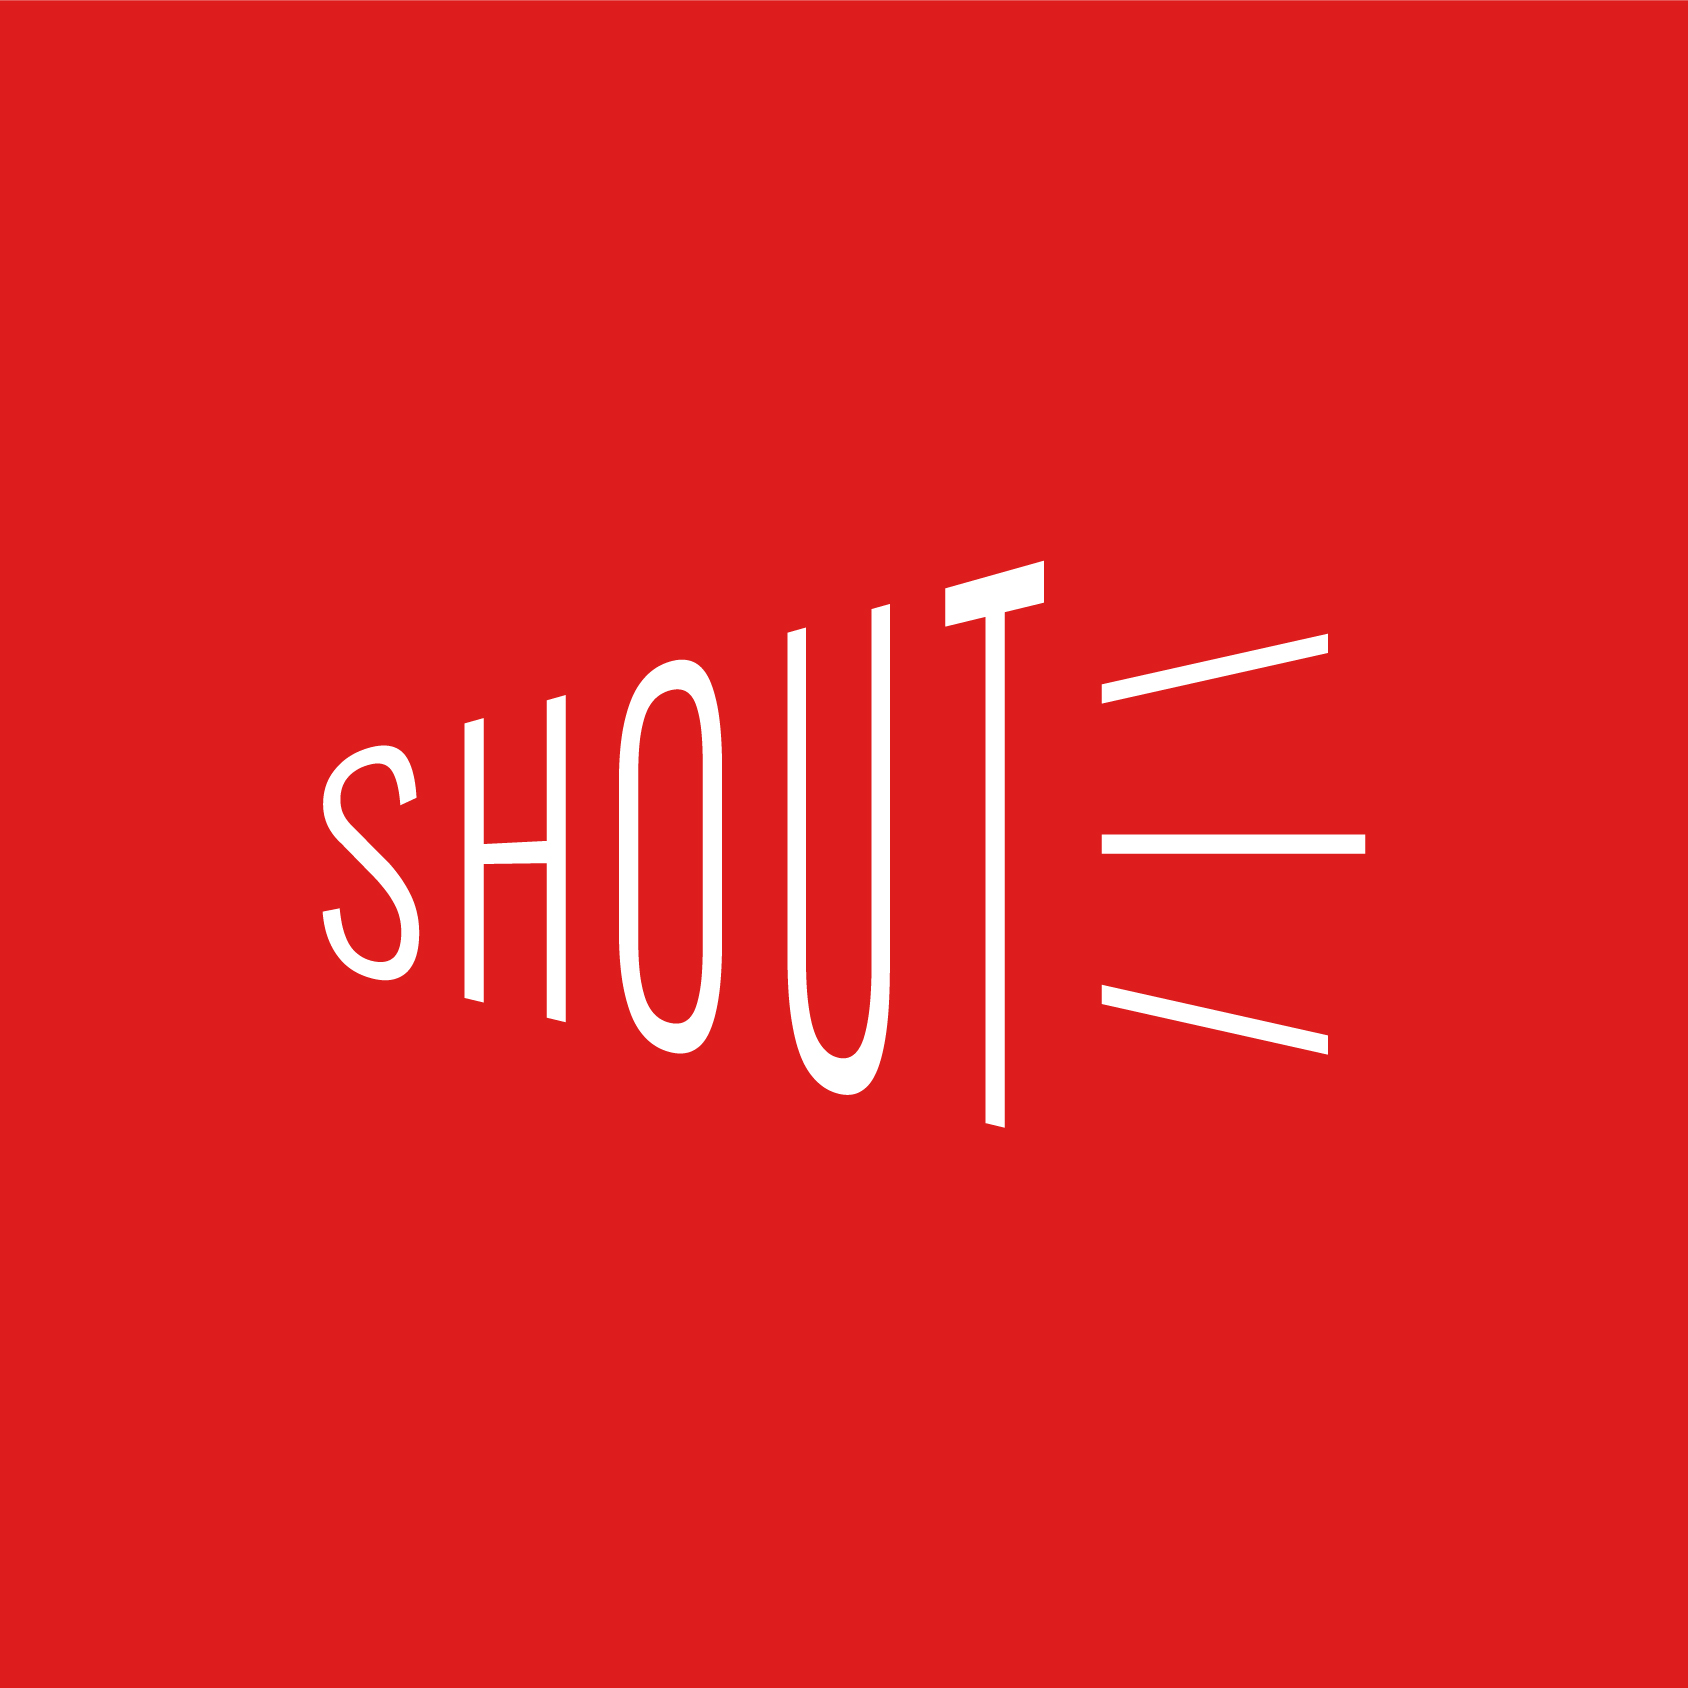 shout-1x1.jpg